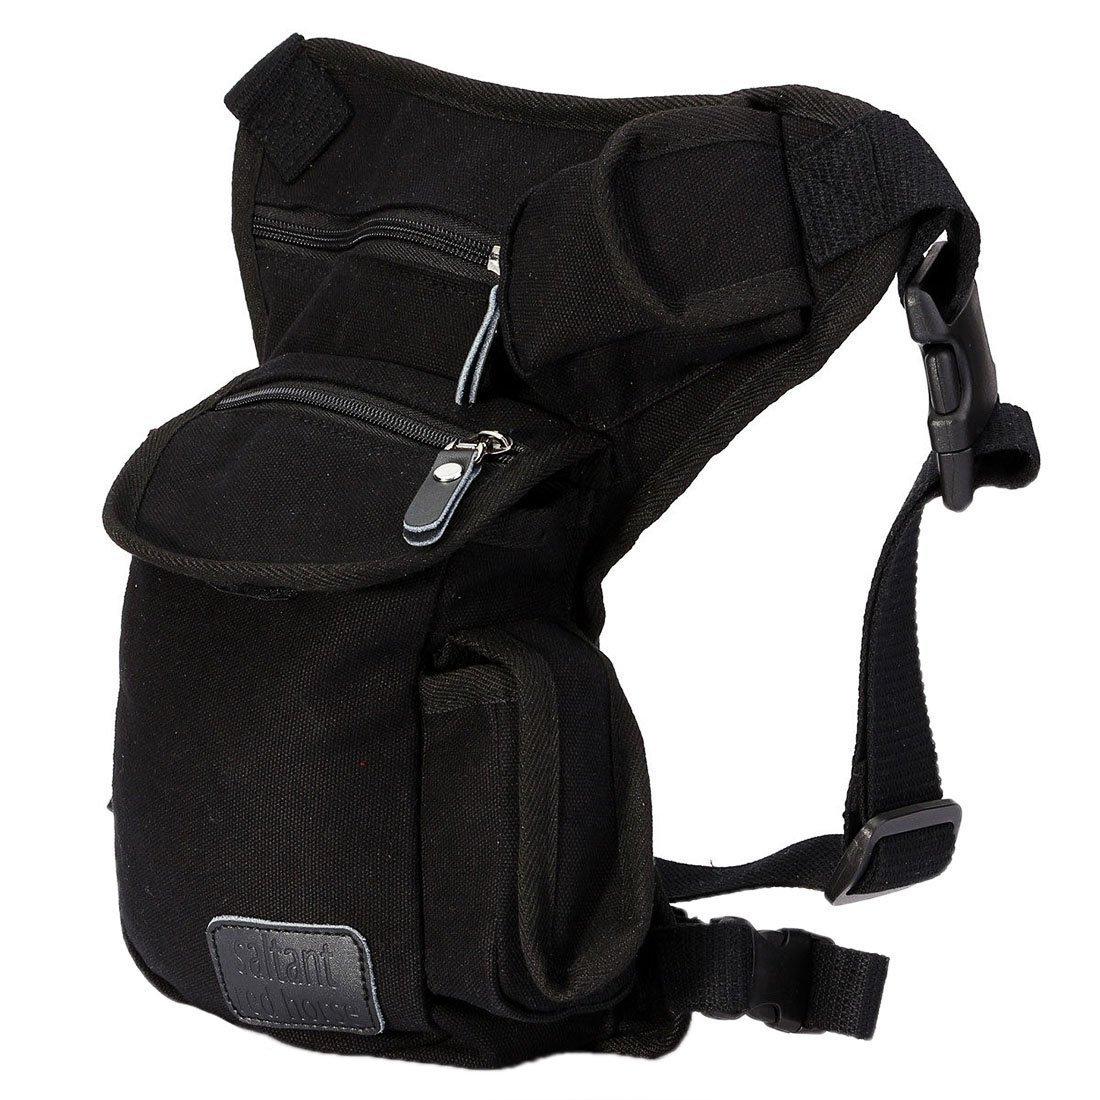 Multi-Purpose Leg Bag - TOOGOO(R)Outdoor Tactical Military Drop Leg Bag Panel Utility Waist Belt Pouch Hiking Bag black